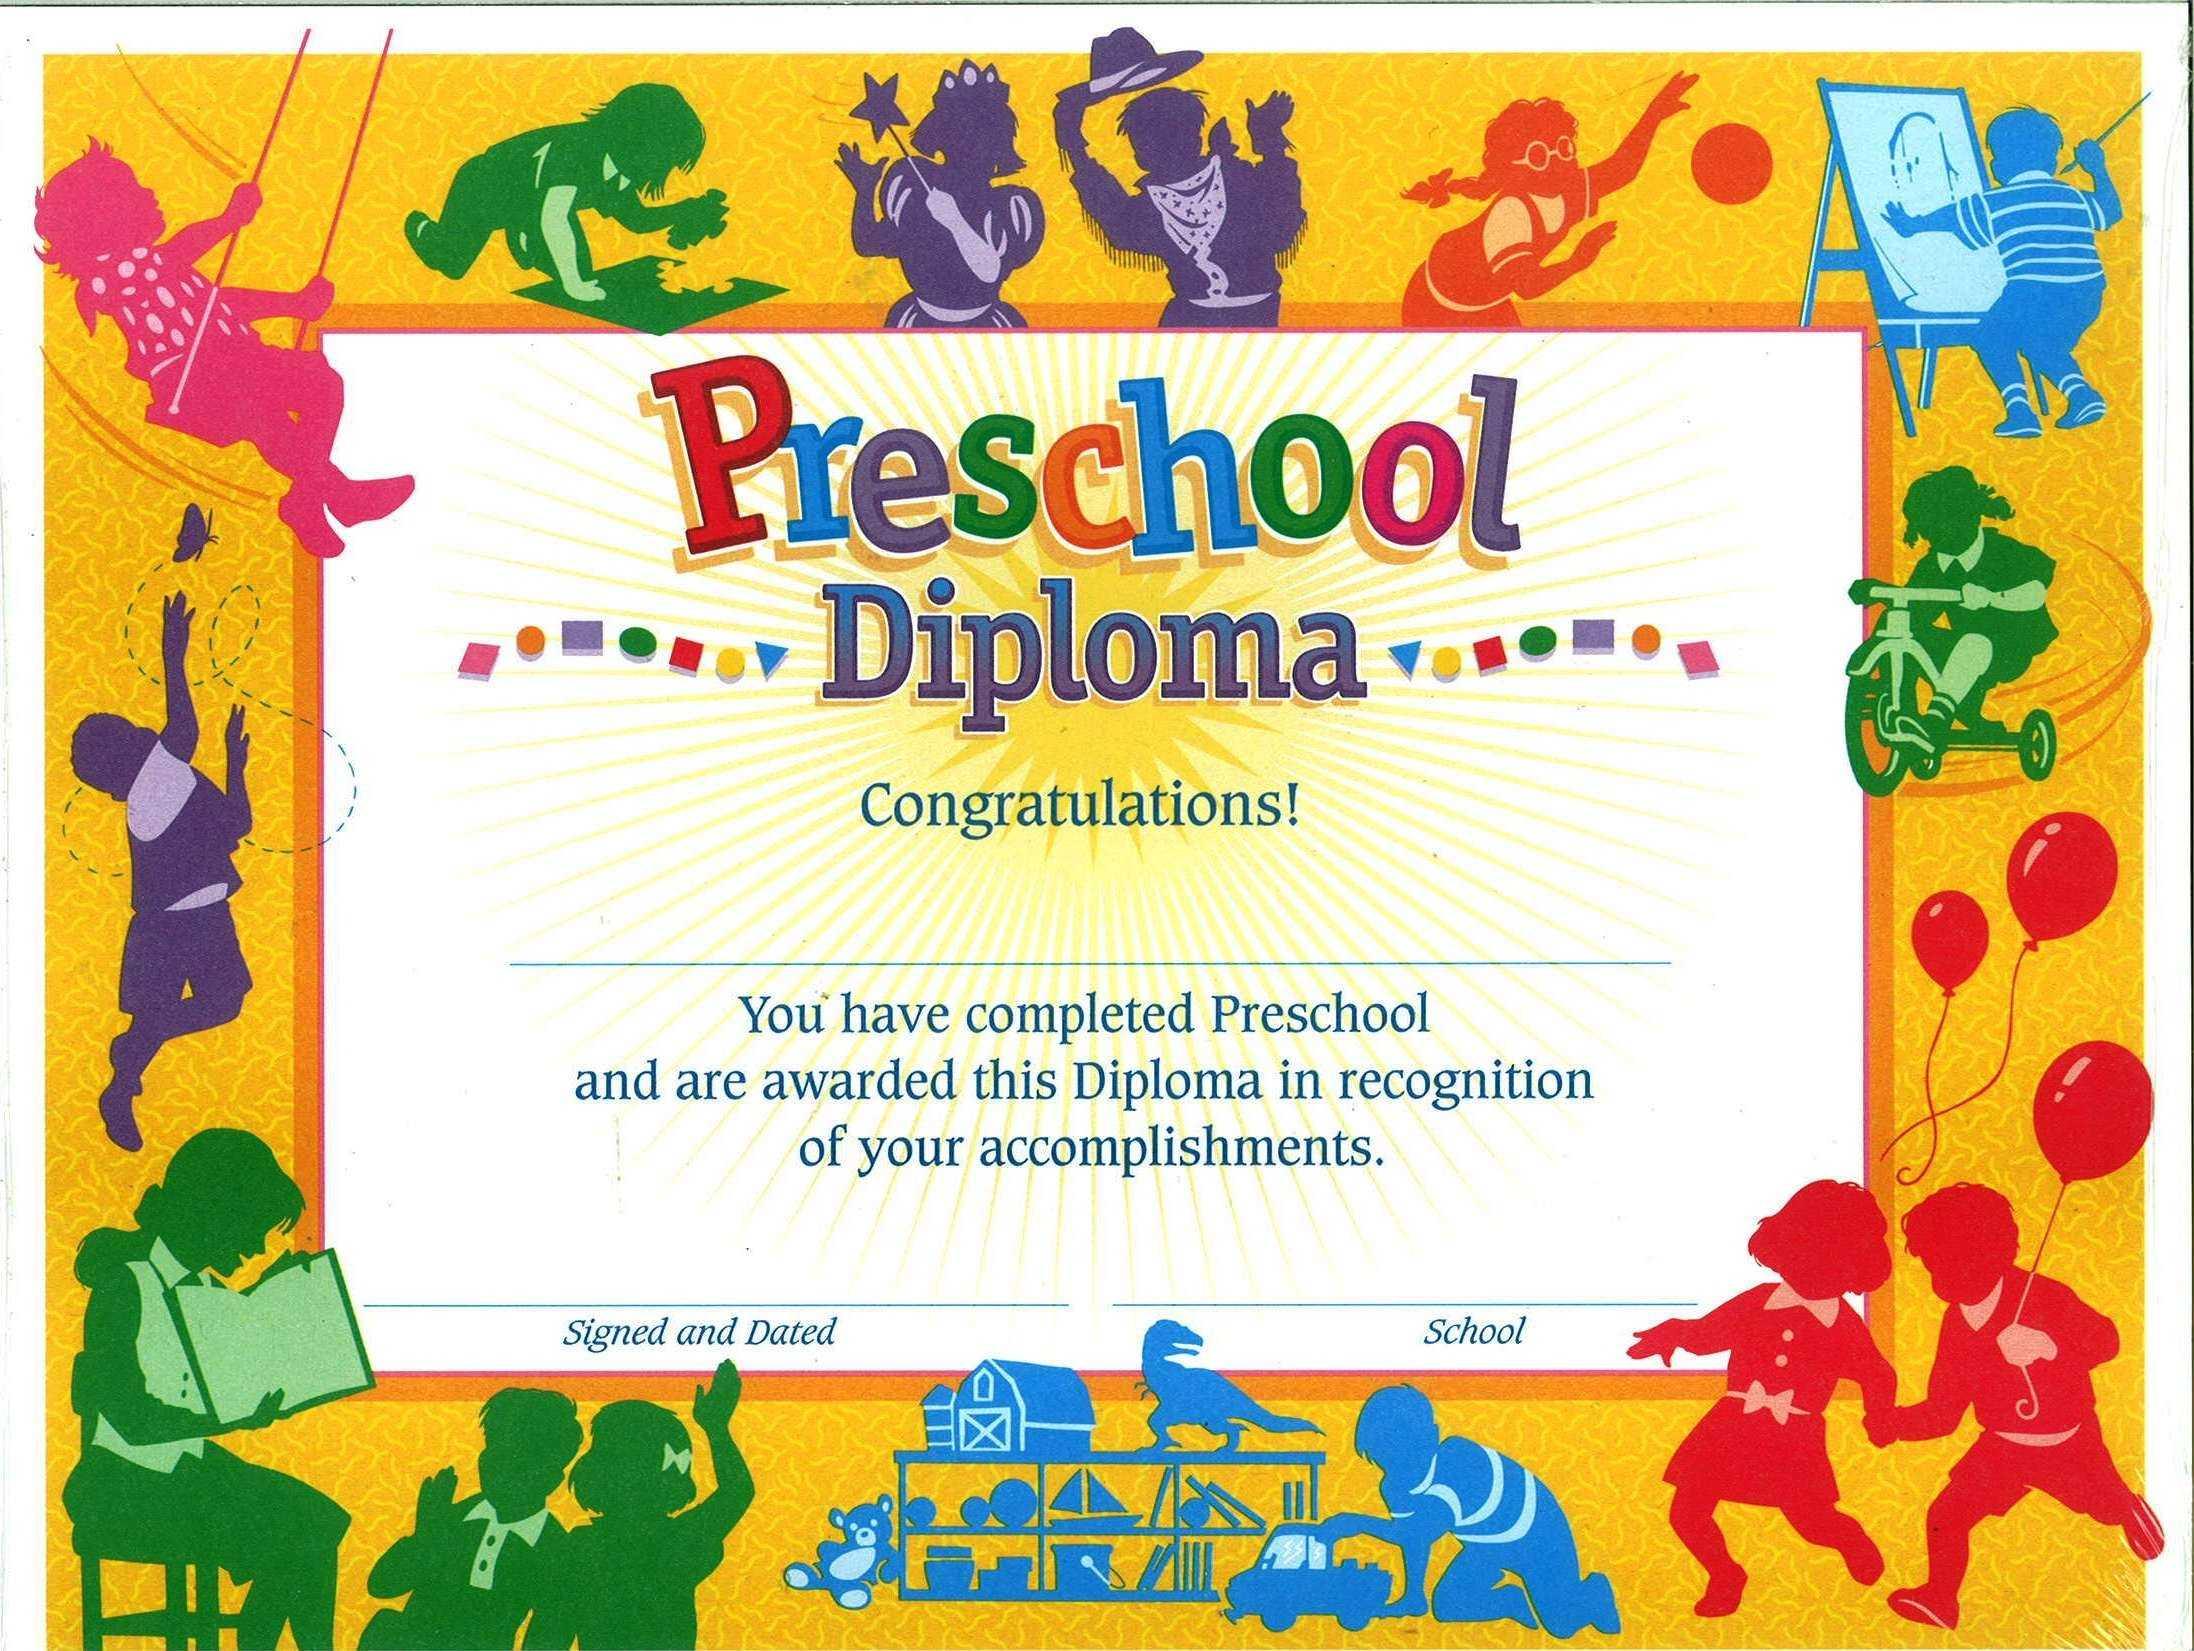 Preschool Graduation Diploma Free Printable   Free Printable with Free Printable Graduation Certificate Templates